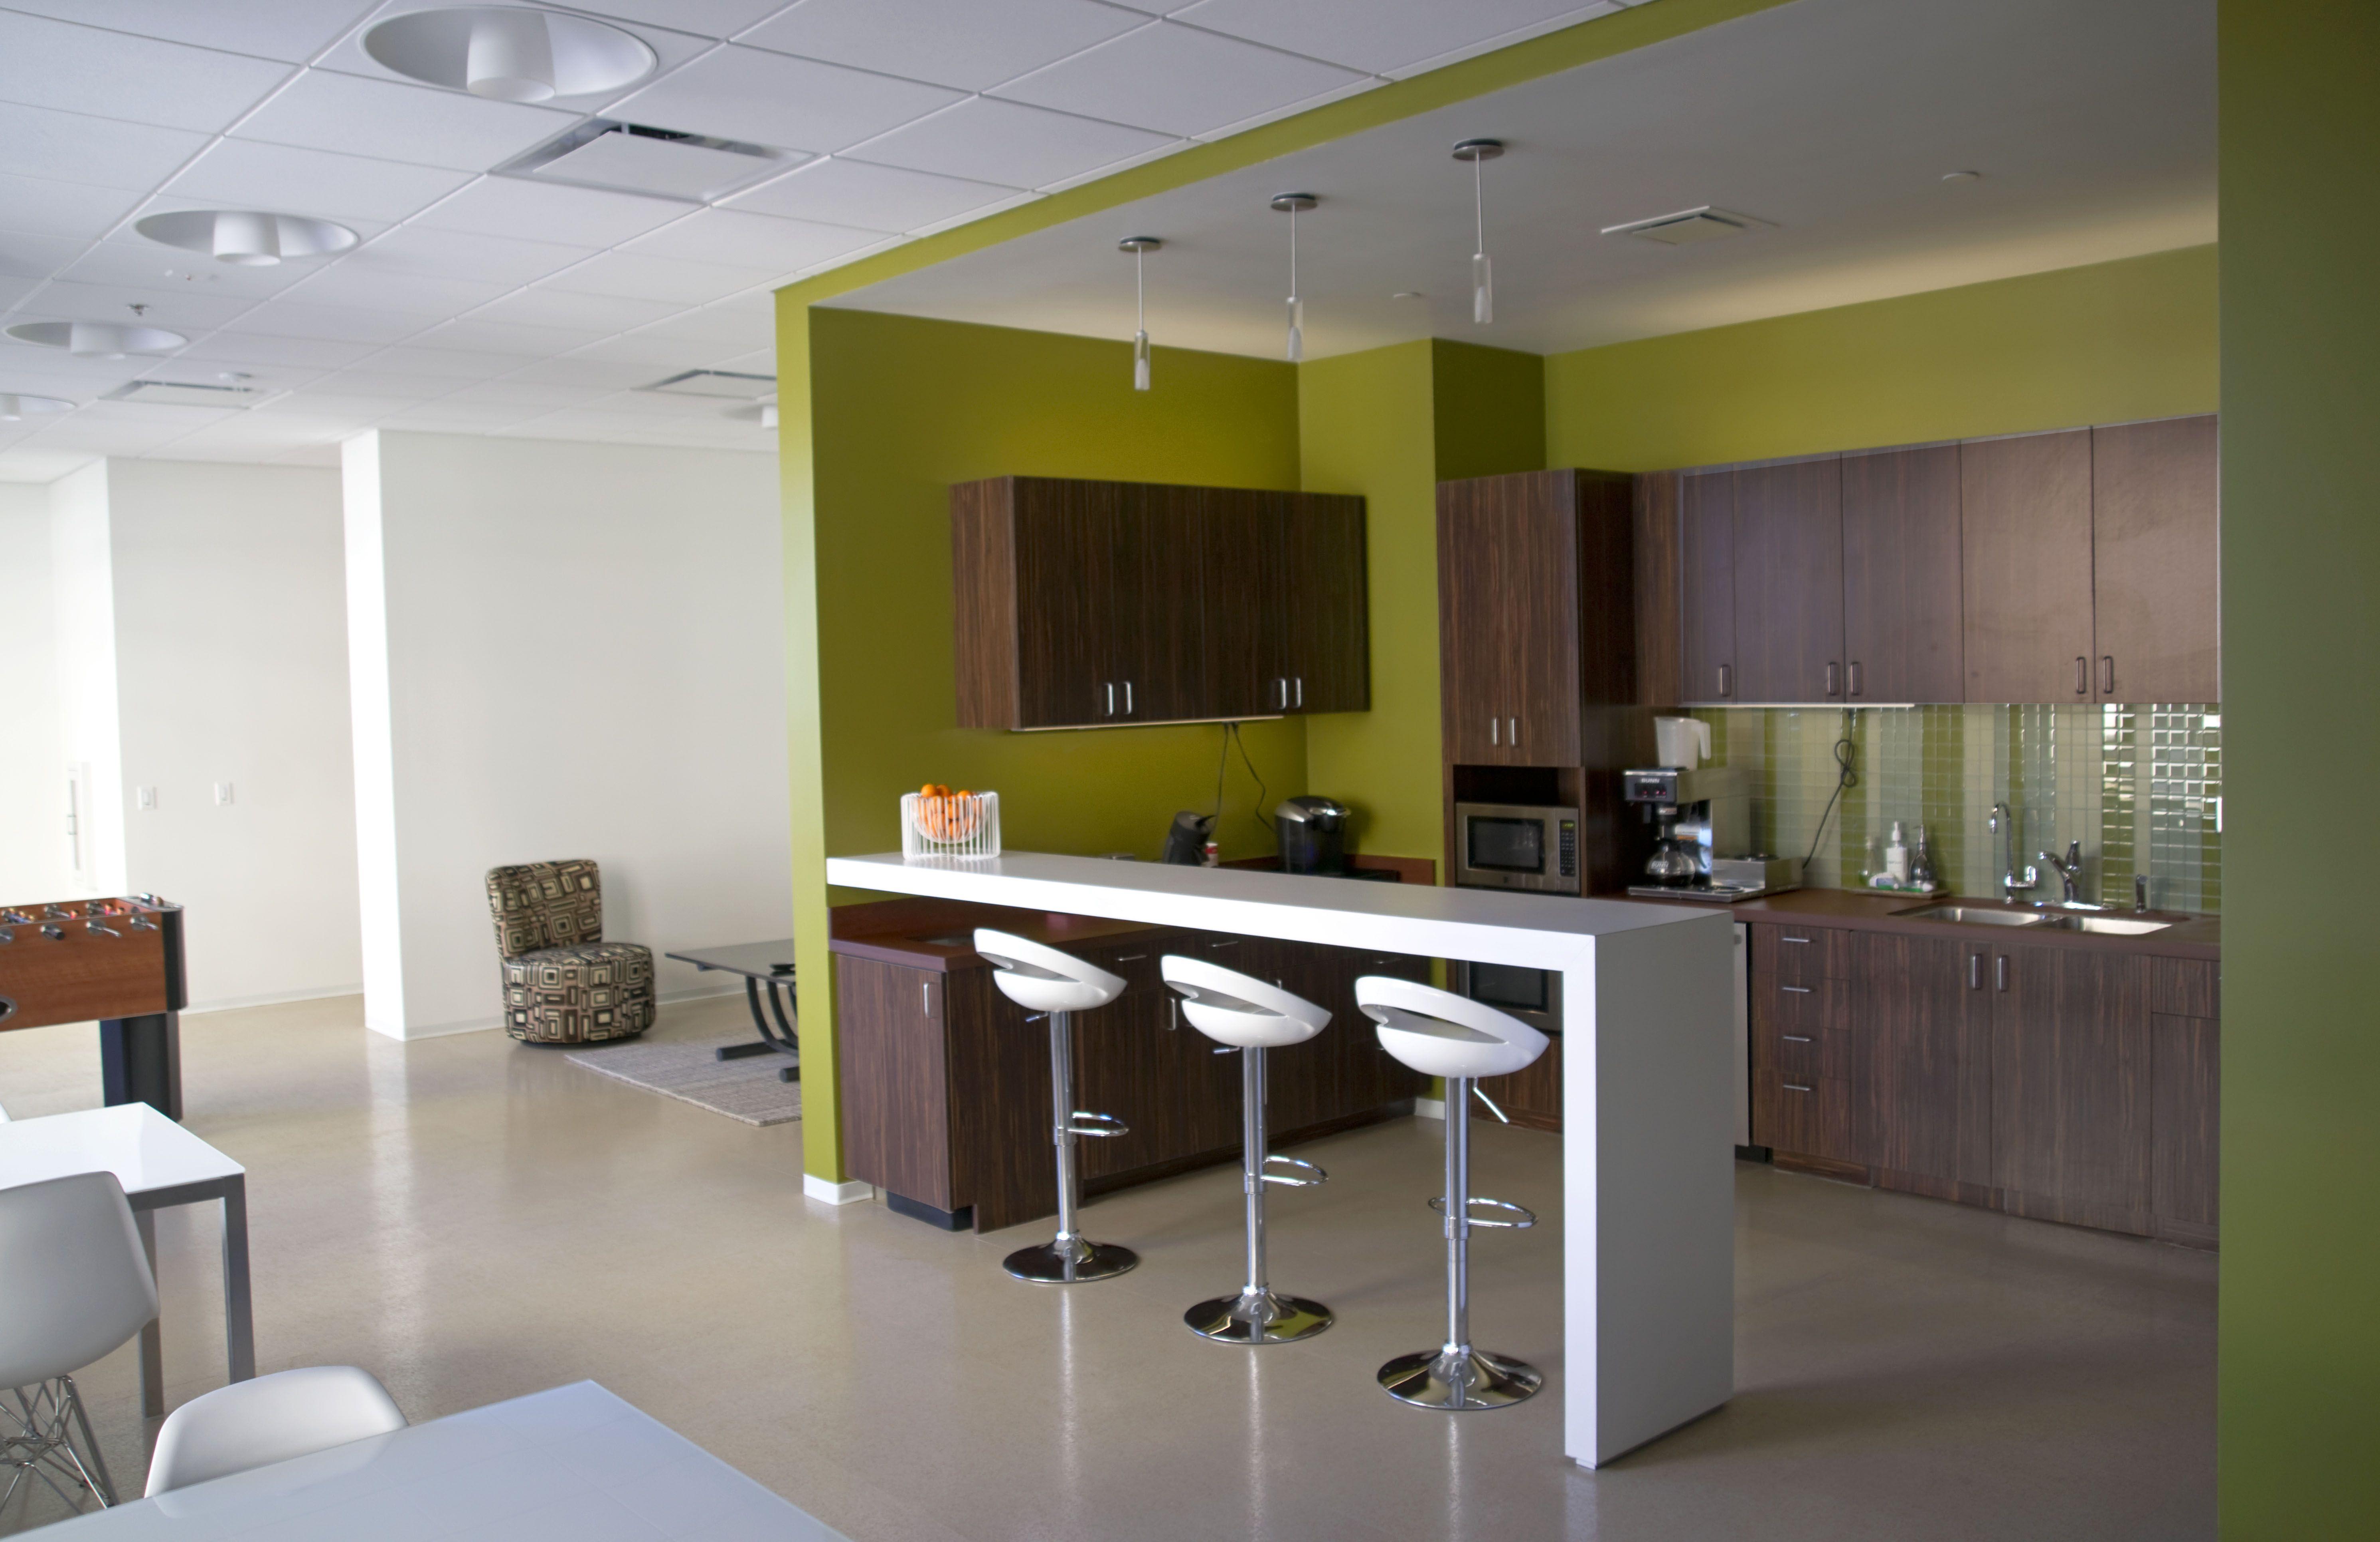 Break room | 1455 Market Inspiration | Pinterest | Break room, Room on kitchen microwave ideas, kitchen space ideas, kitchen office organization ideas,